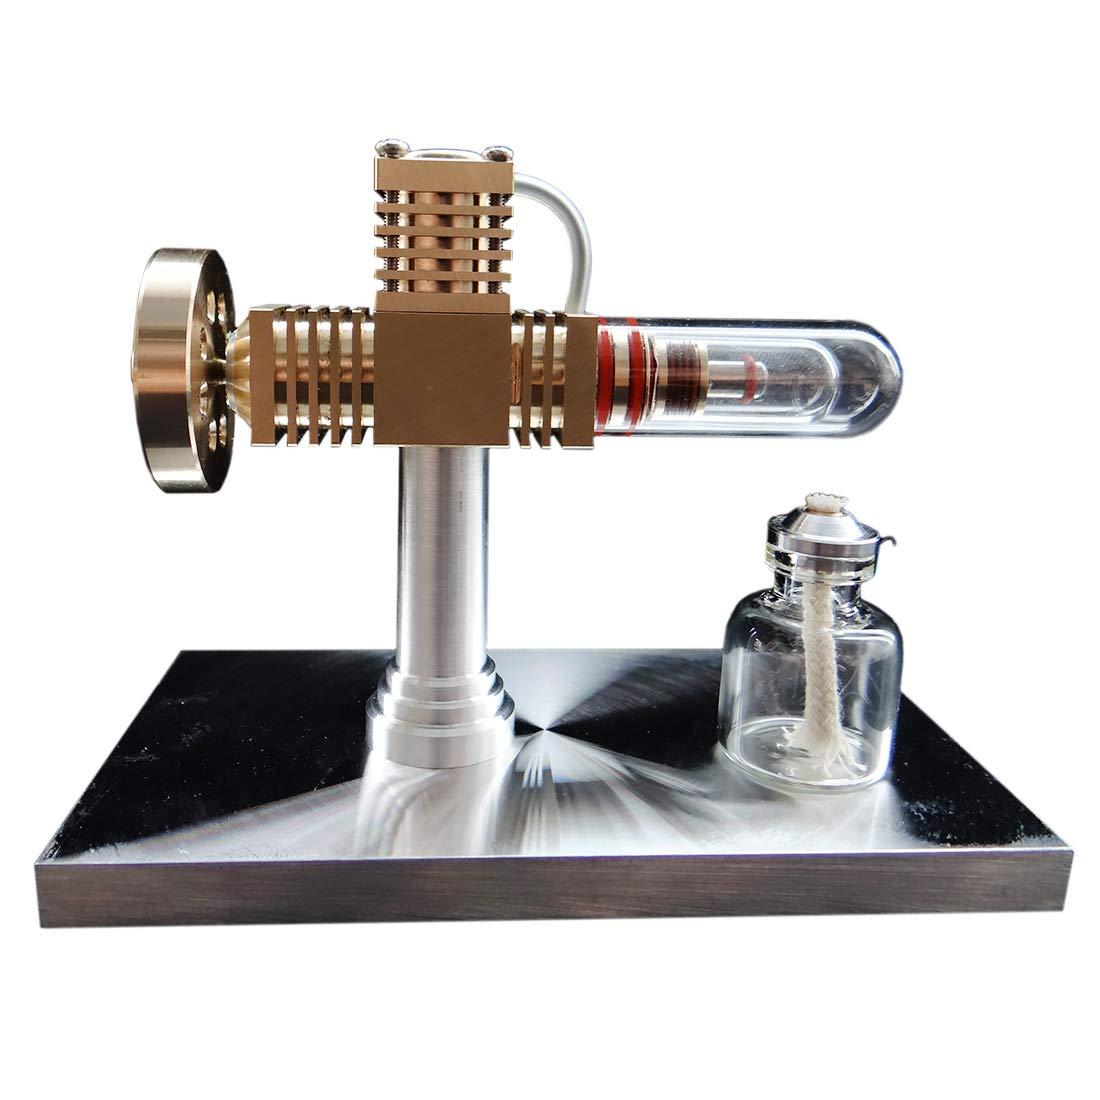 PeleusTech® Stirling Engine Model Hot Air Engine Kit Quartz Heat Pipe Free-Piston Stirling Engine for Gift, Teaching